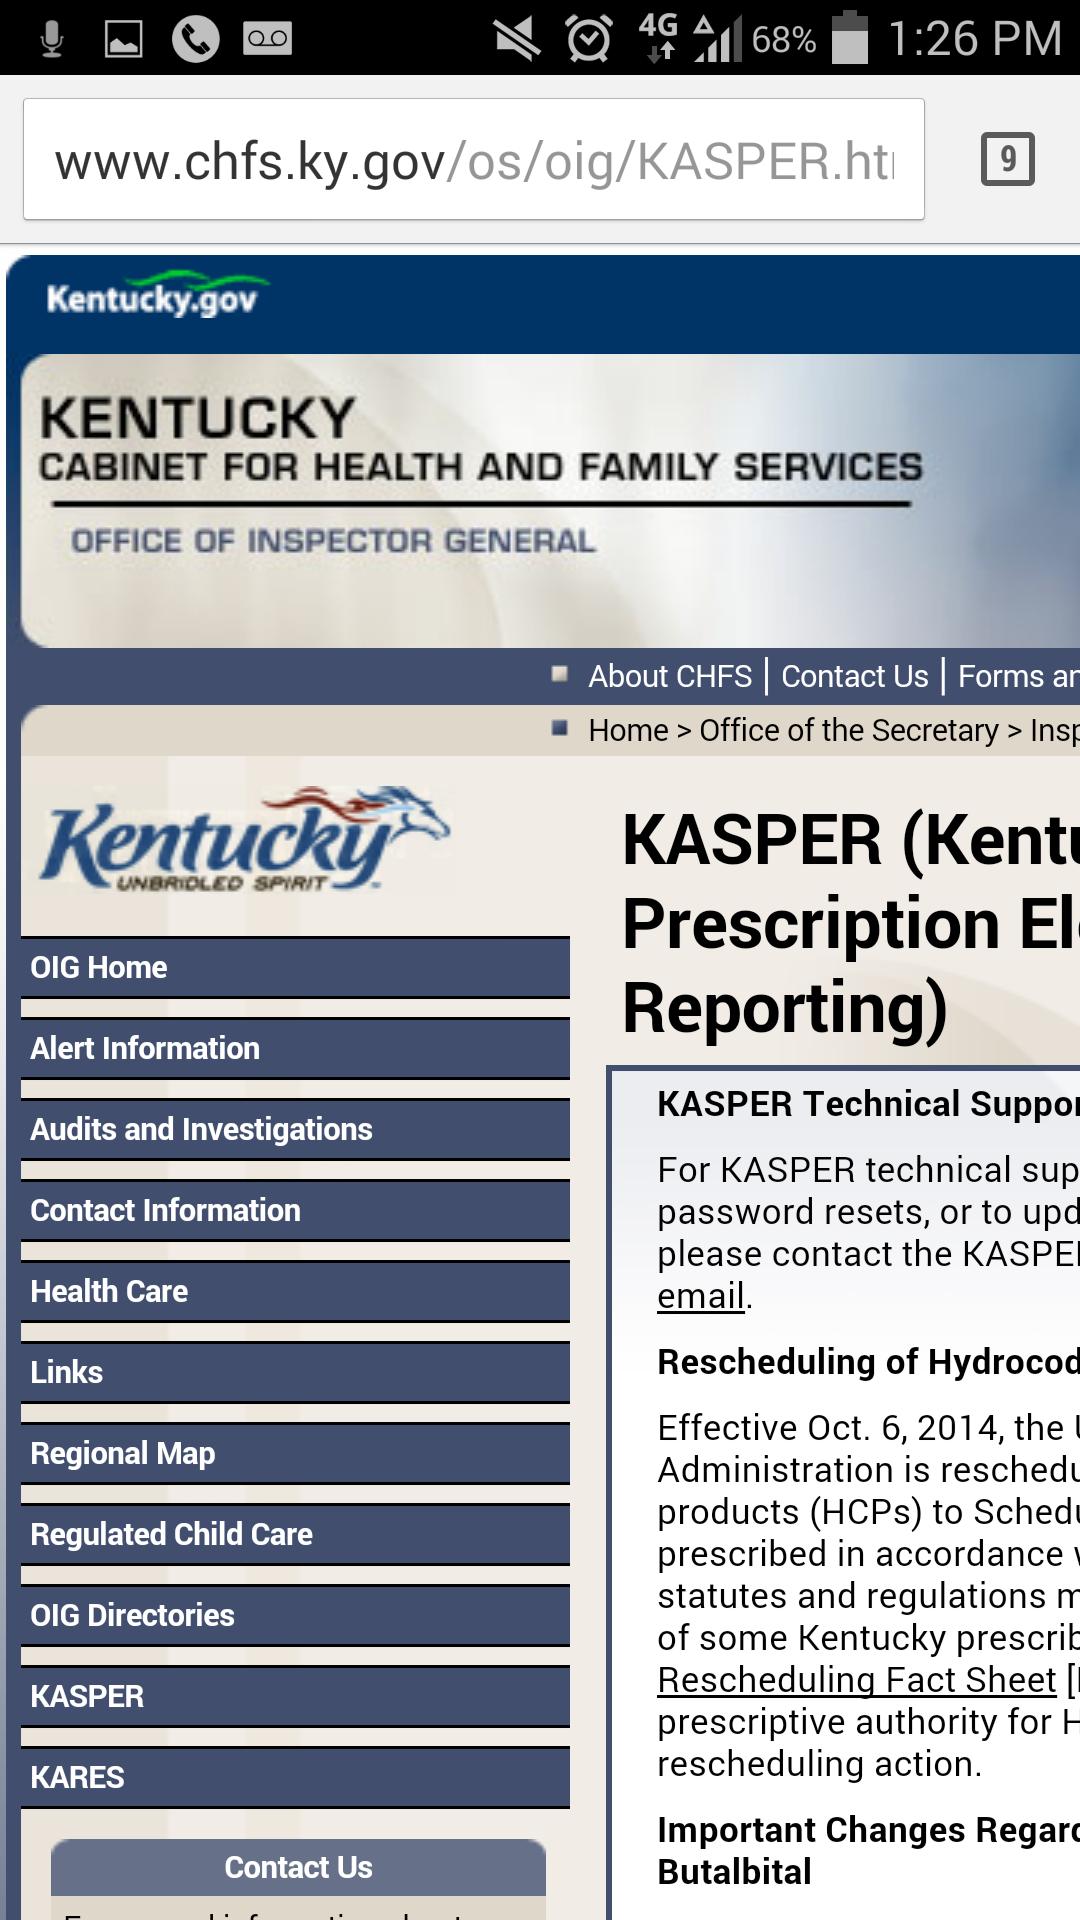 Kentucky KASPER